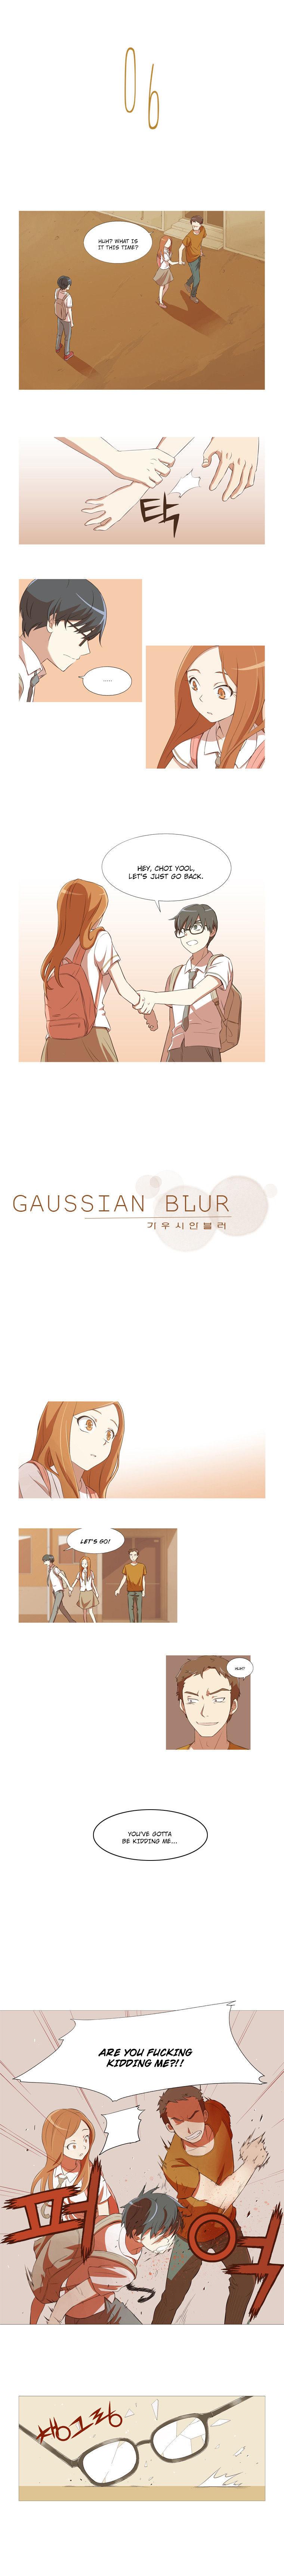 Gaussian Blur 6 Page 1